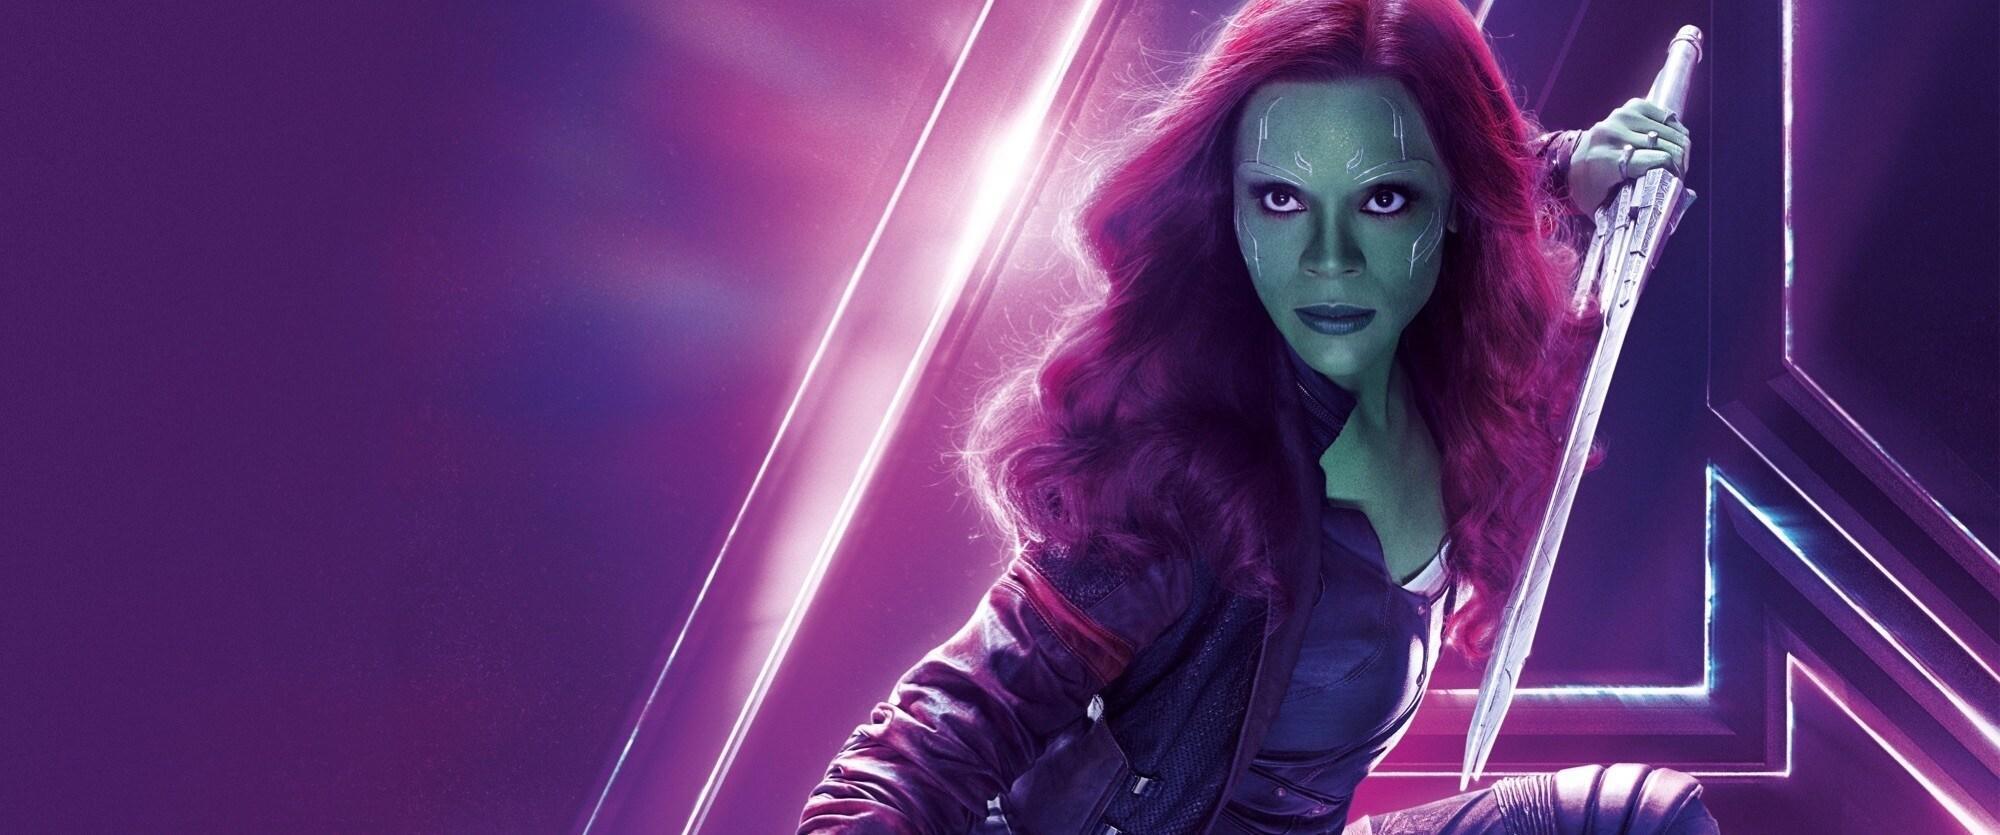 Avengers: Infinity War | AB 26. APRIL IM KINO